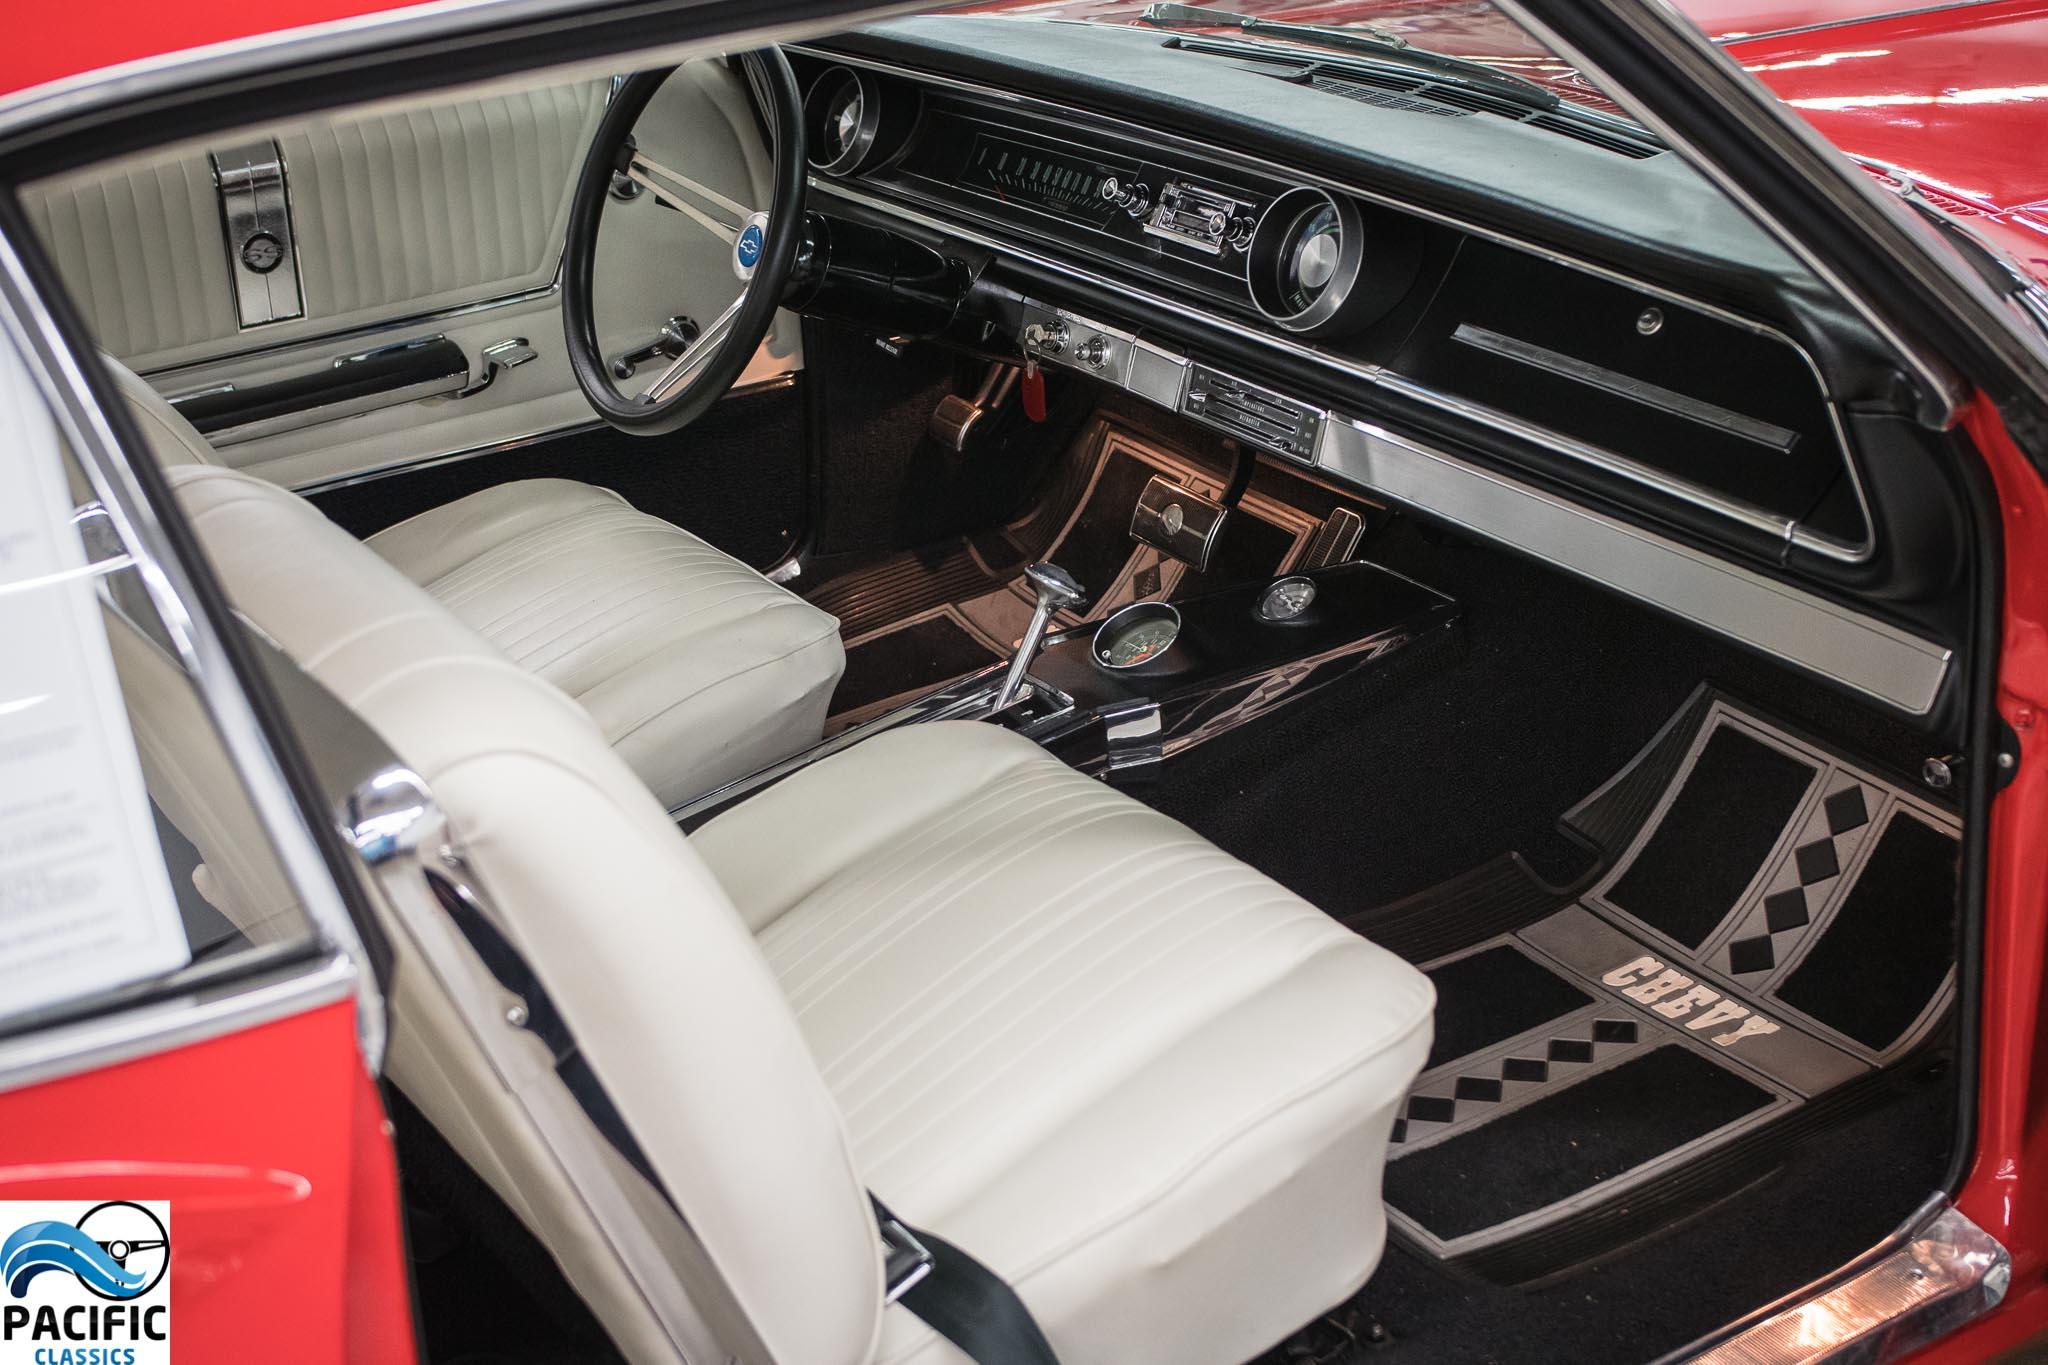 1965 Chevrolet Impala SS 396